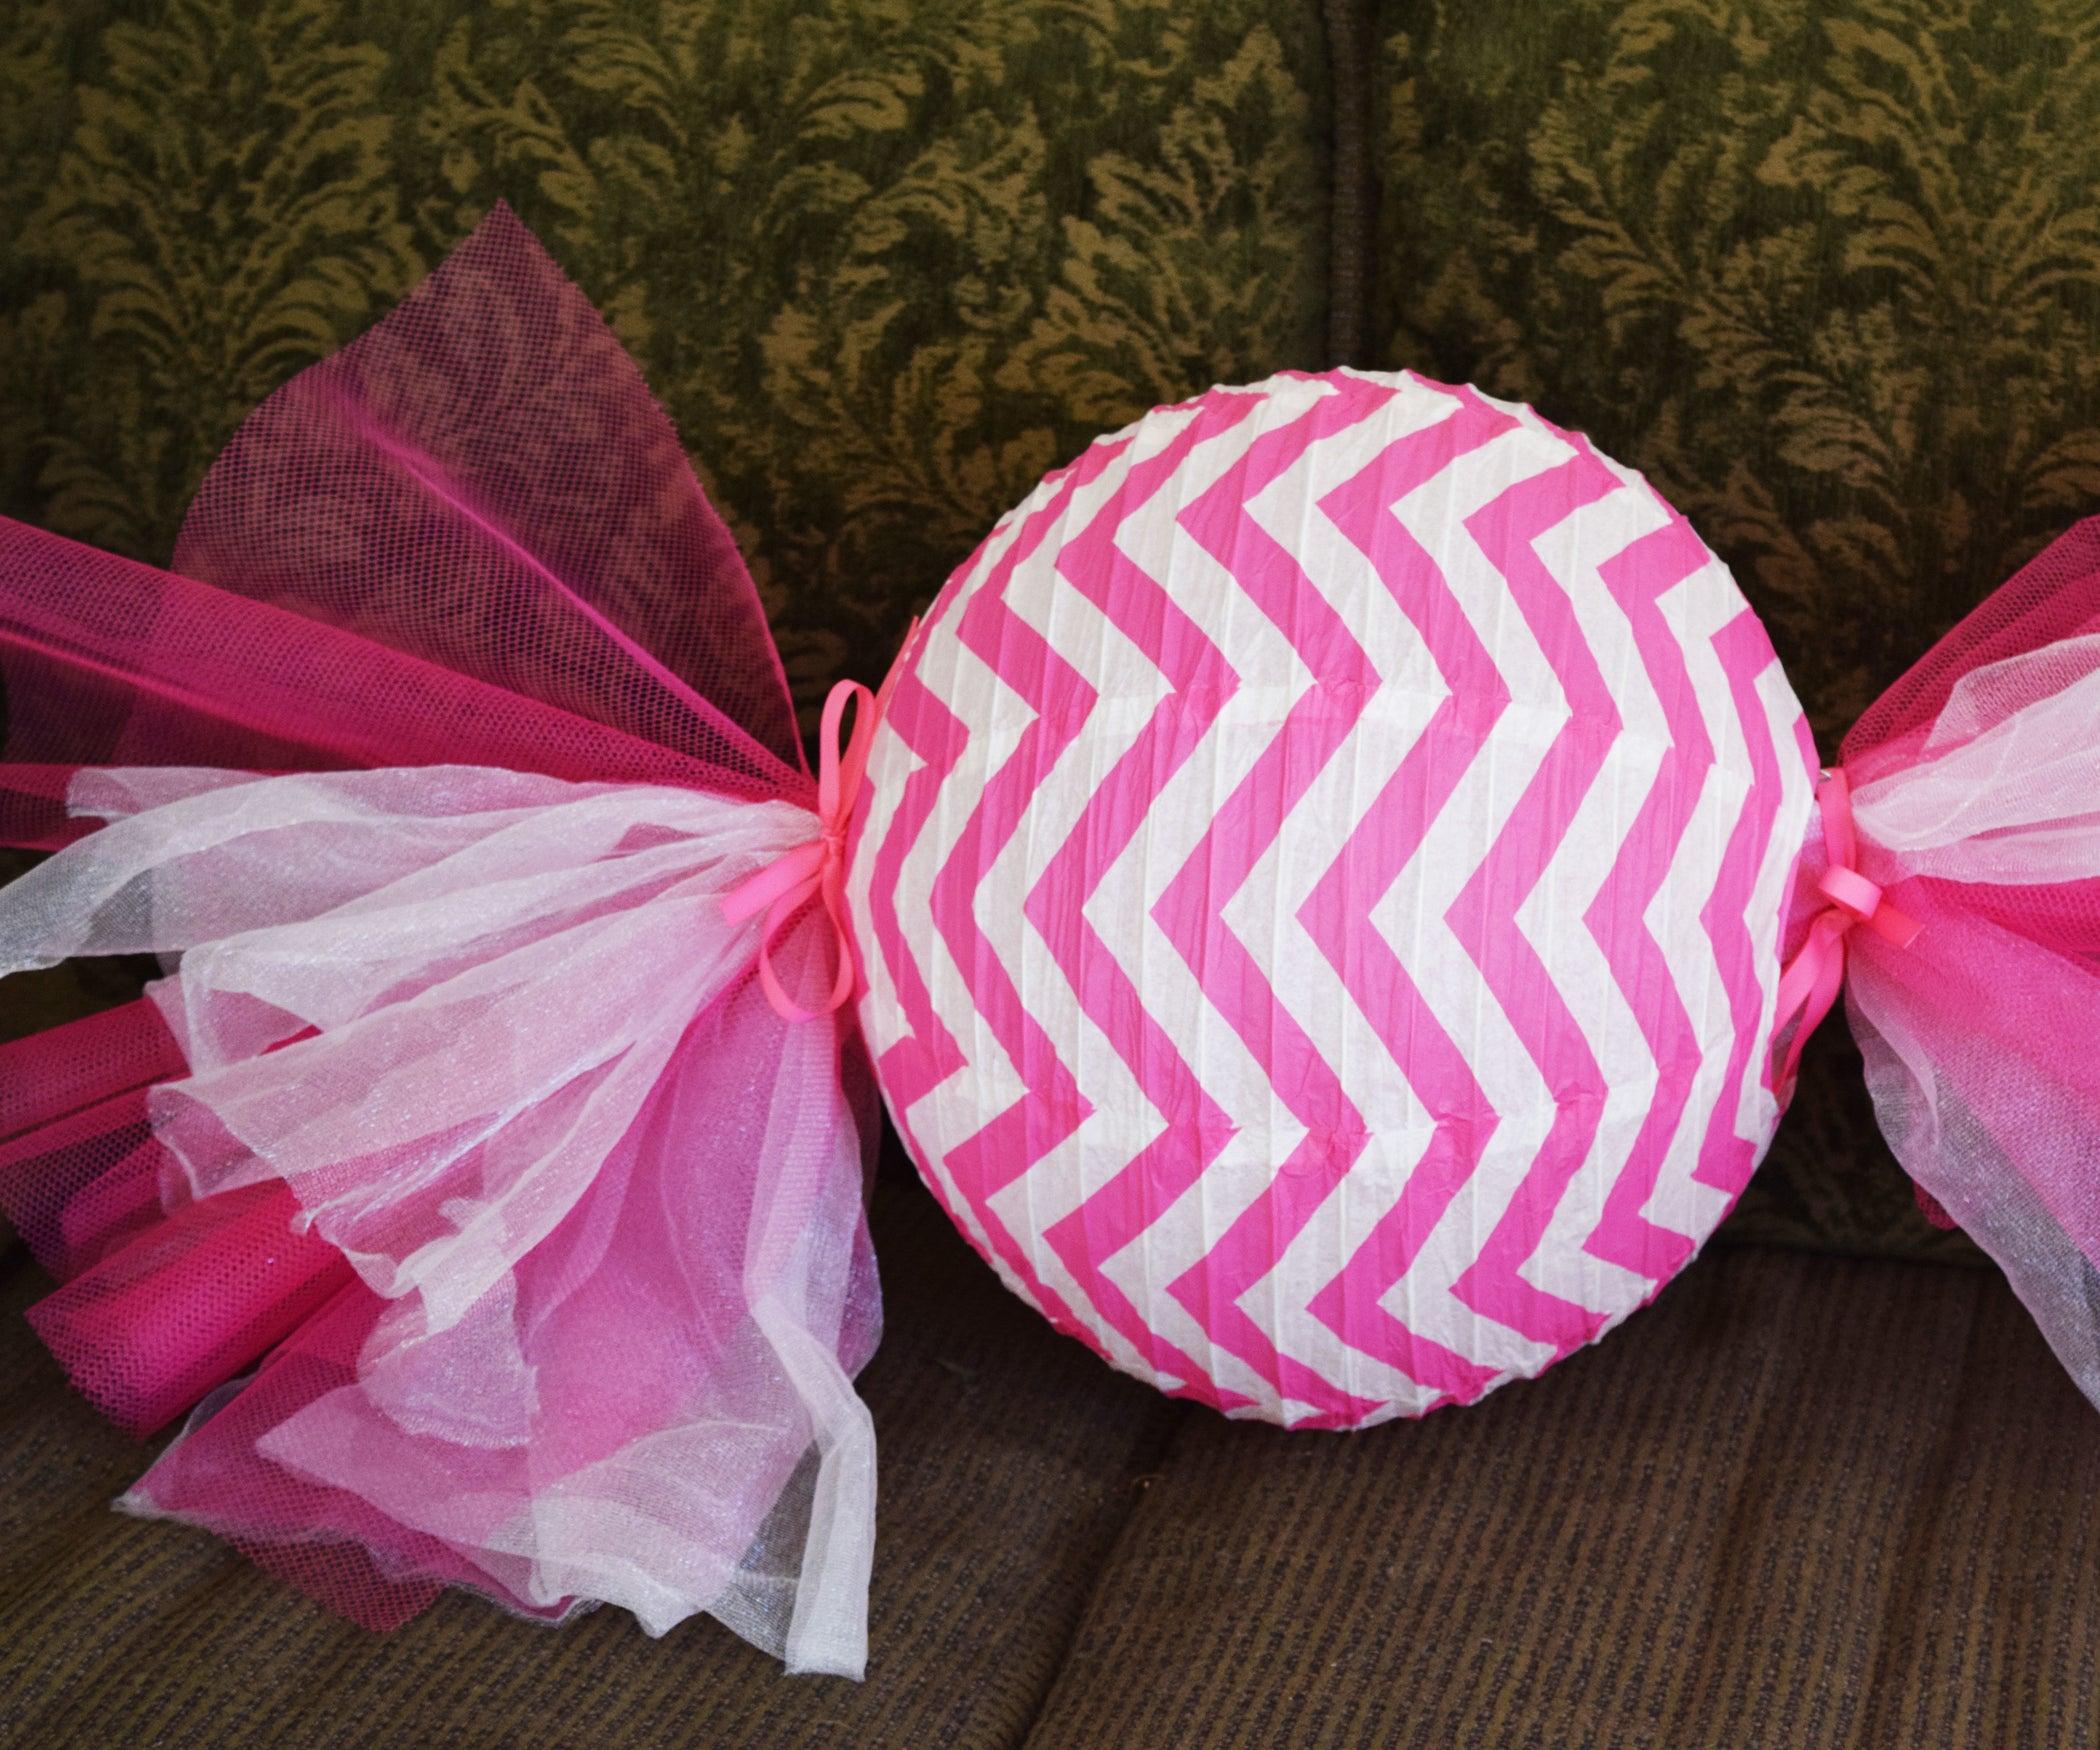 DIY Decorative Candy Paper Lantern Tutorial